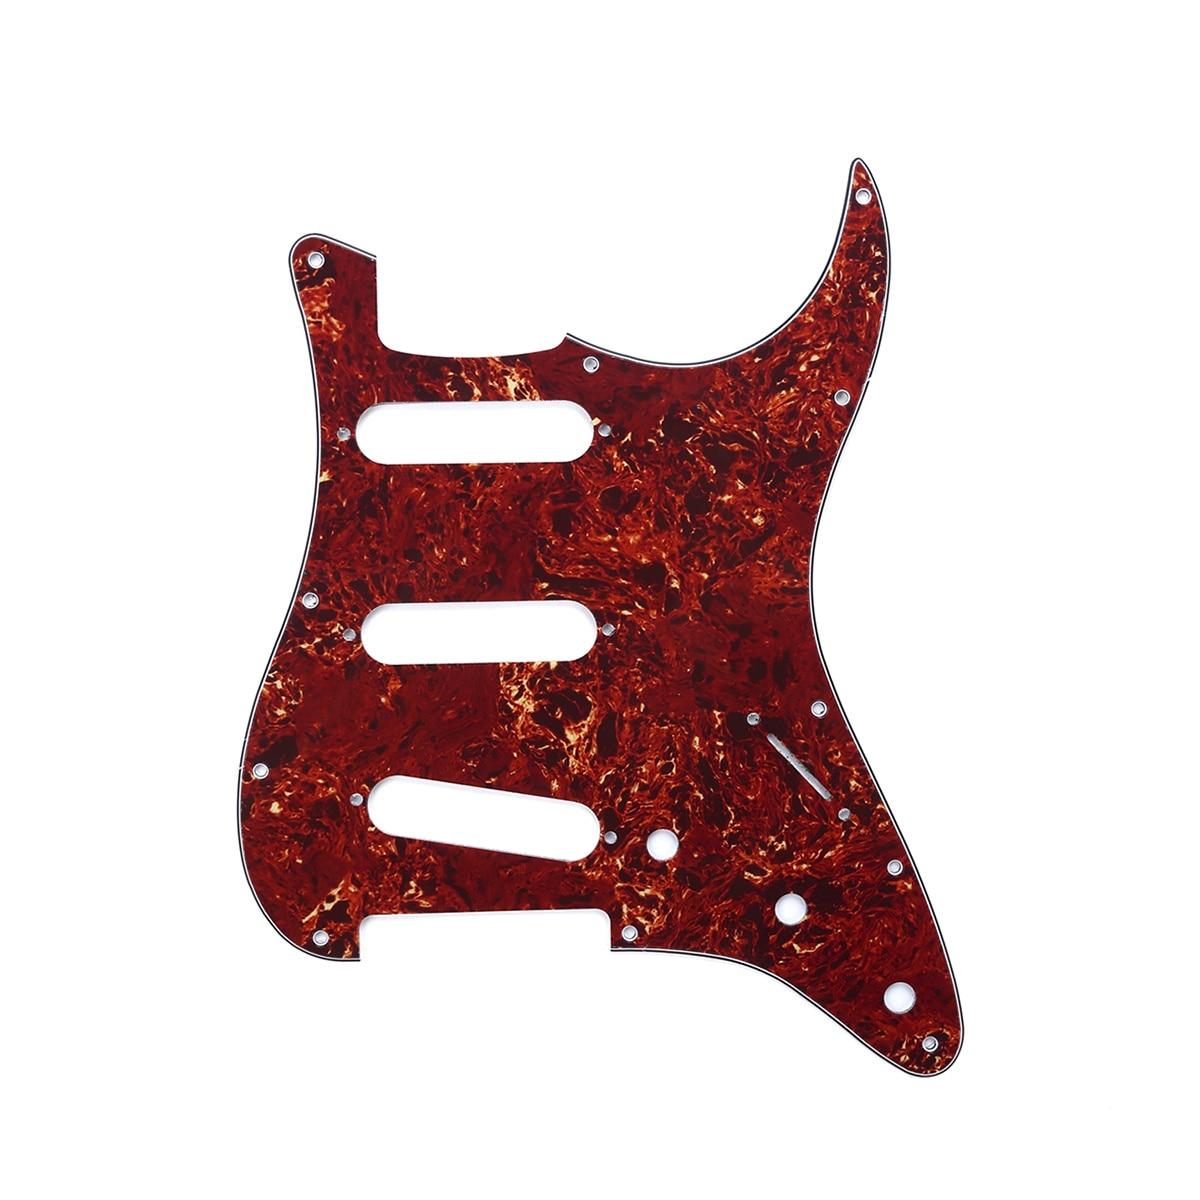 Musiclili SSS 11 agujero Strat guitarra Pickguard para Fender USA/mexicano hecho estándar...